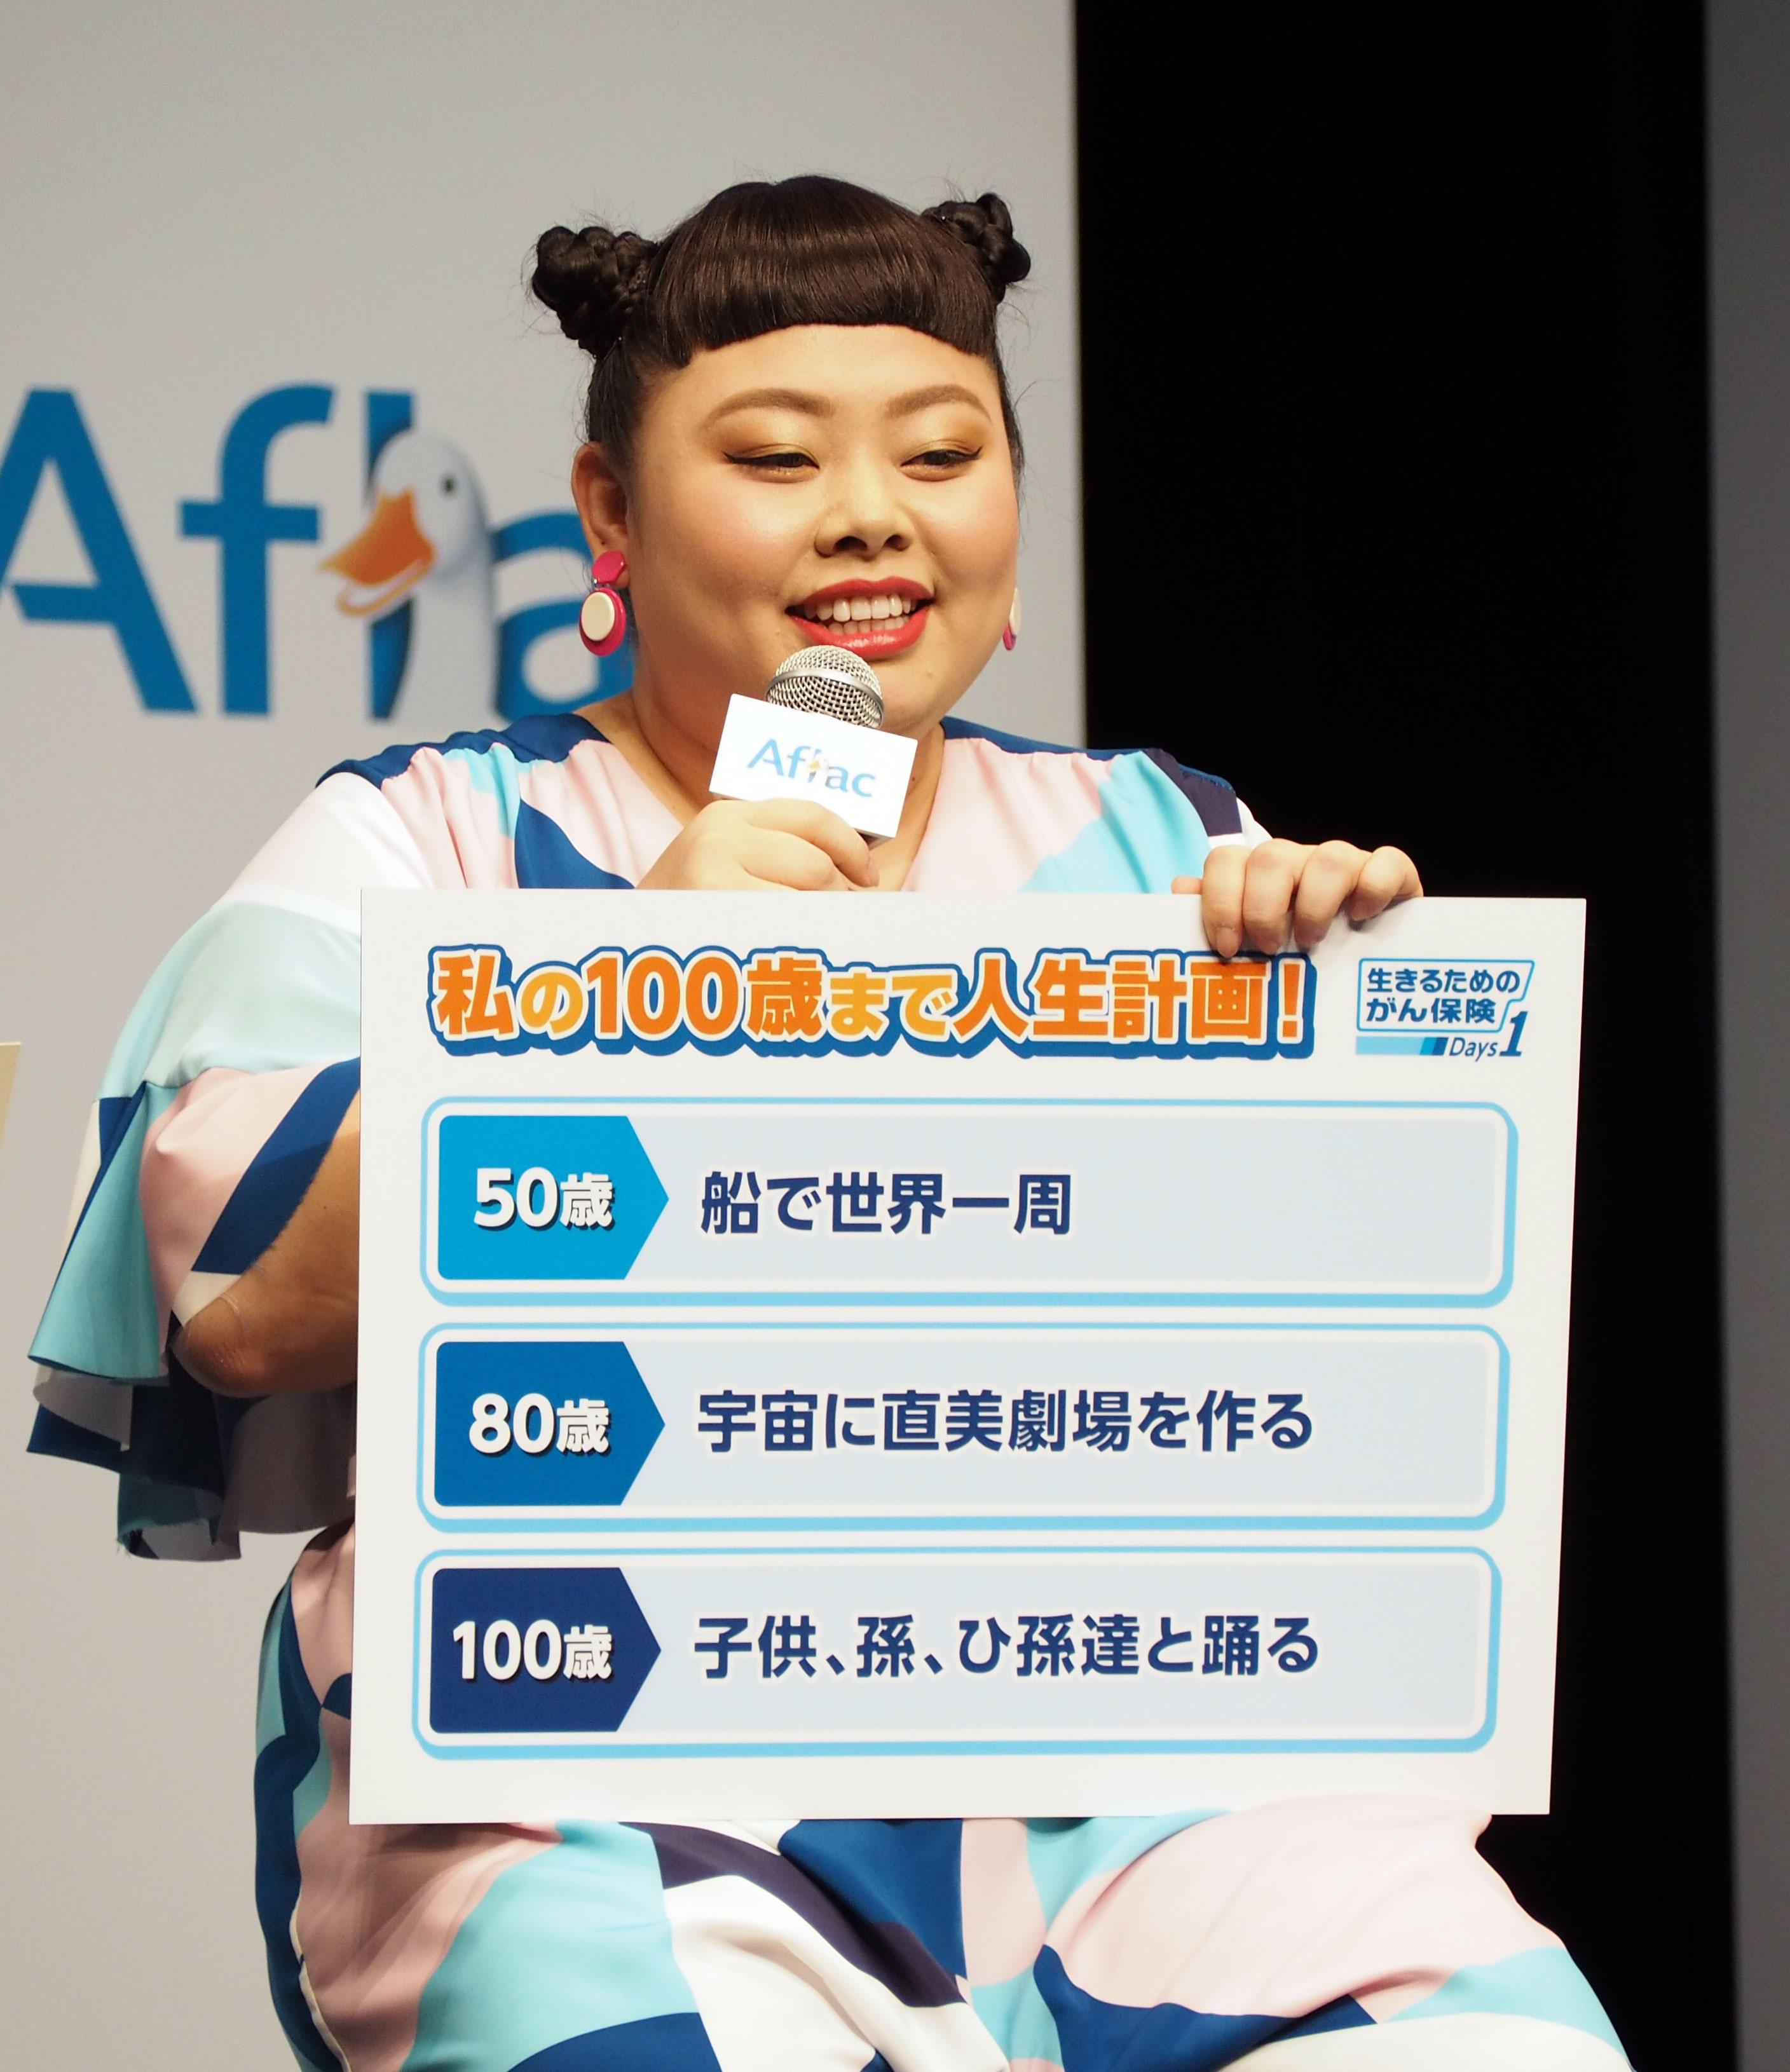 http://news.yoshimoto.co.jp/20180314185534-526aa95ad05e80189401267251fbf423f3c818a4.jpg